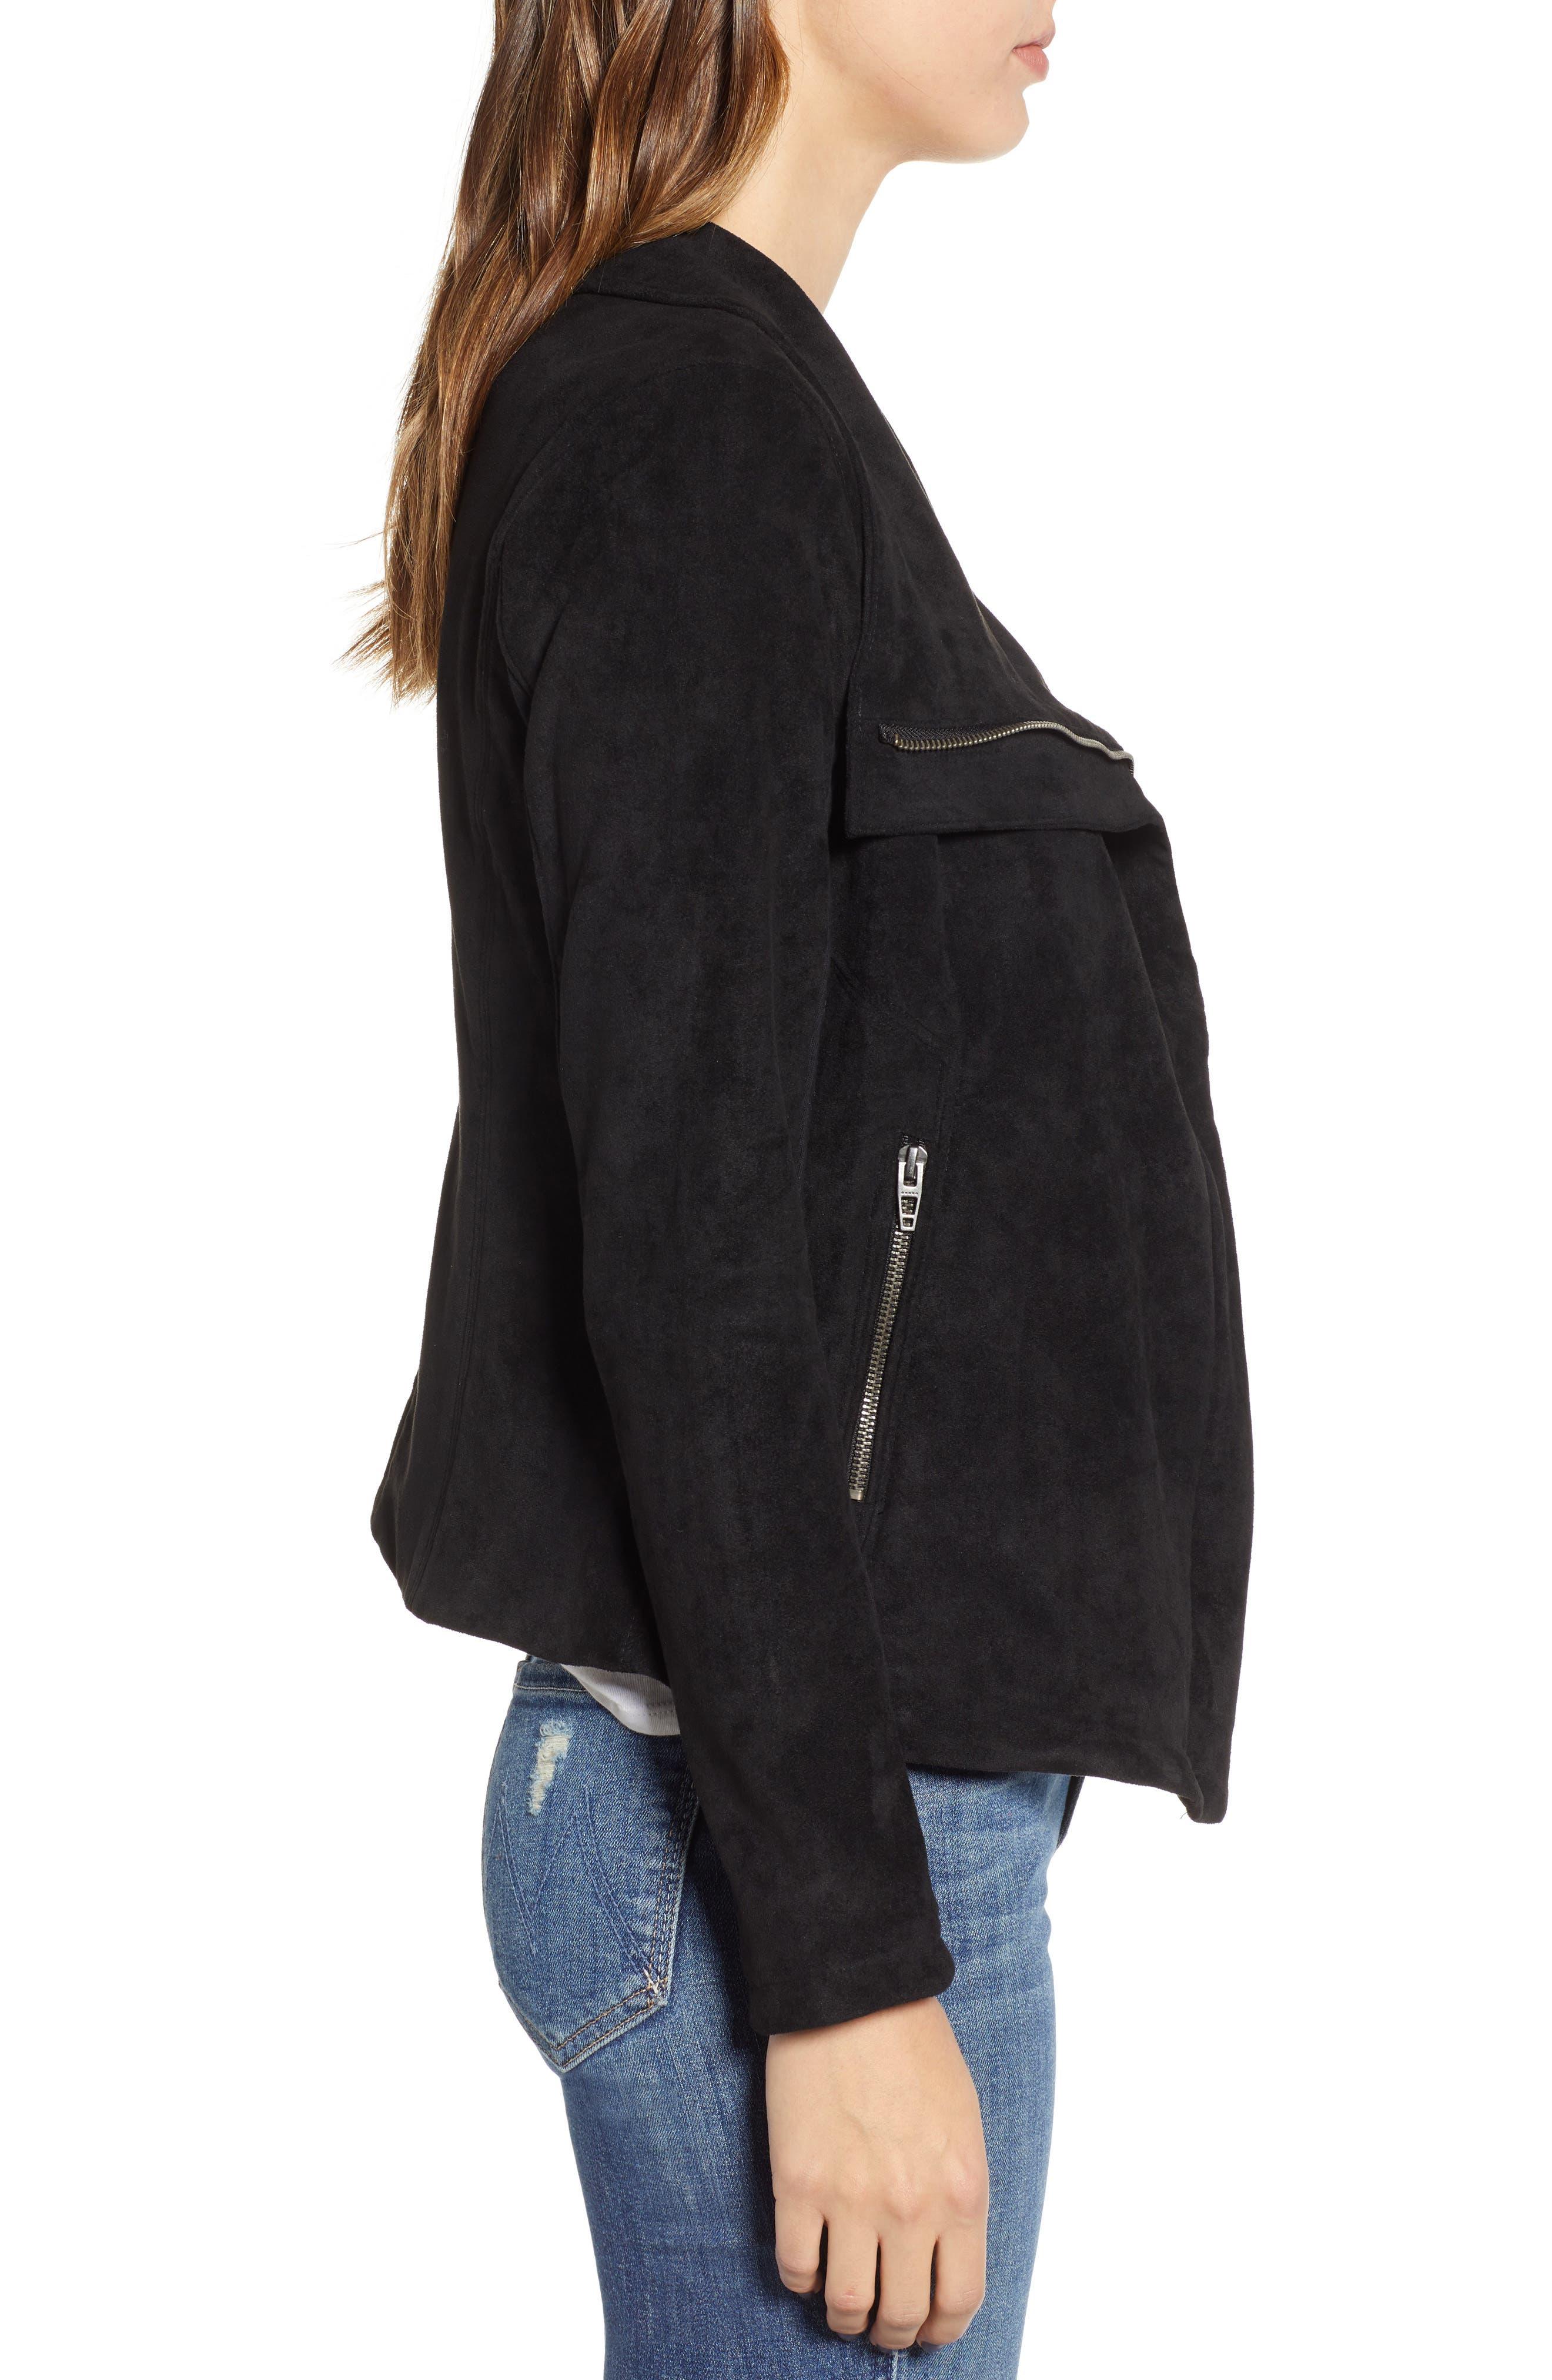 BLANKNYC, Legendary Faux Suede Jacket, Alternate thumbnail 4, color, 001